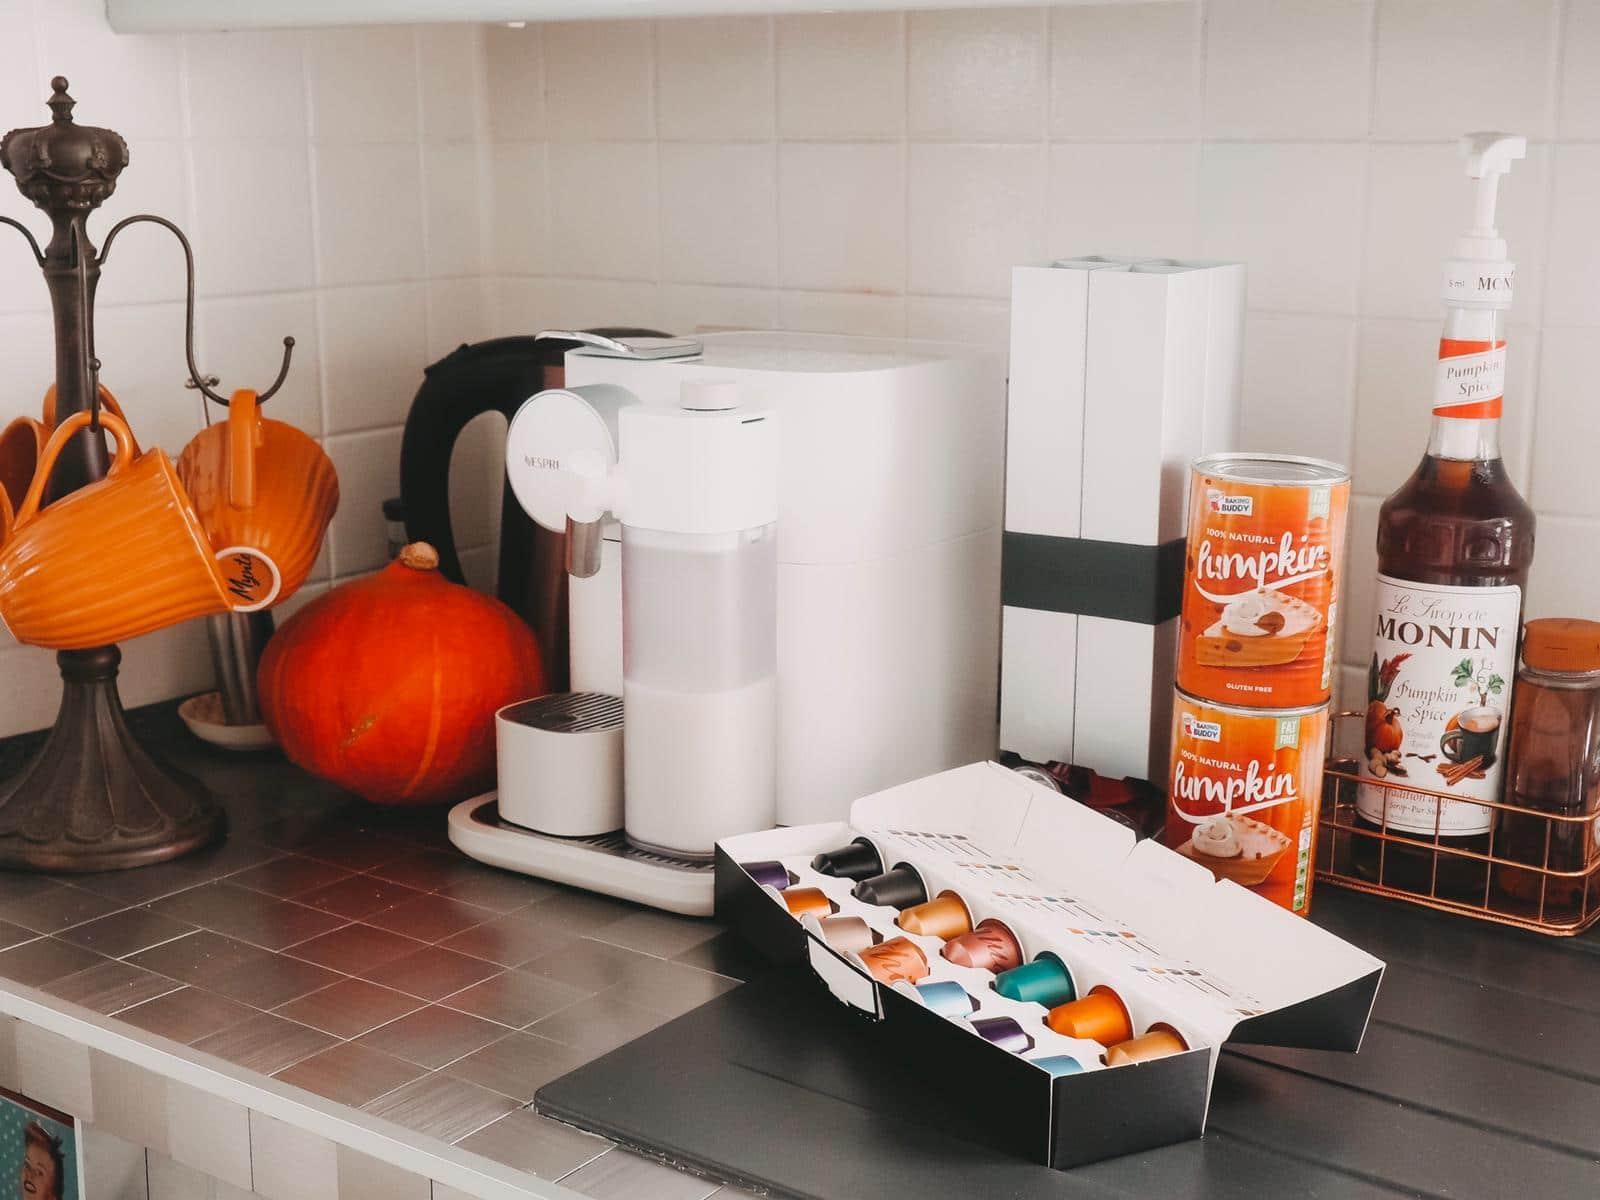 Die neue Nespresso Gran Lattissima bereitet Espresso, Ristretto, Lungo, Cappuccino, Café Latte, Flat White, Milchschaum, heiße Milch und Latte Macchiato zu.